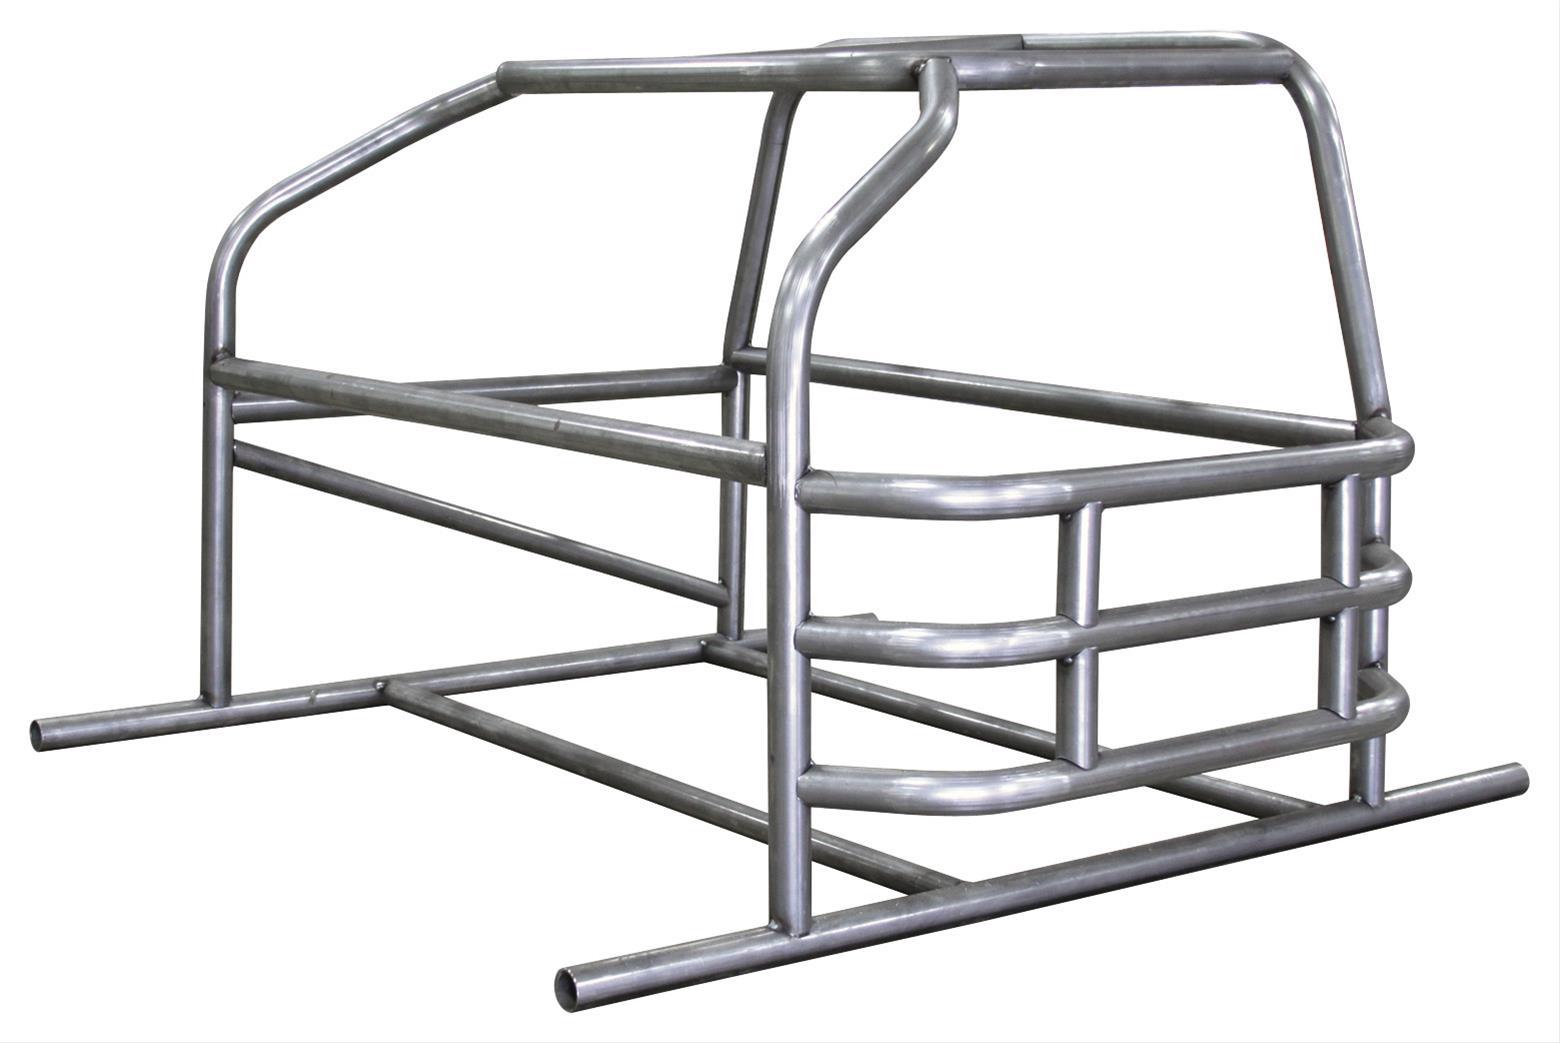 Allstar Performance Mini Enduro Roll Cage Kits All